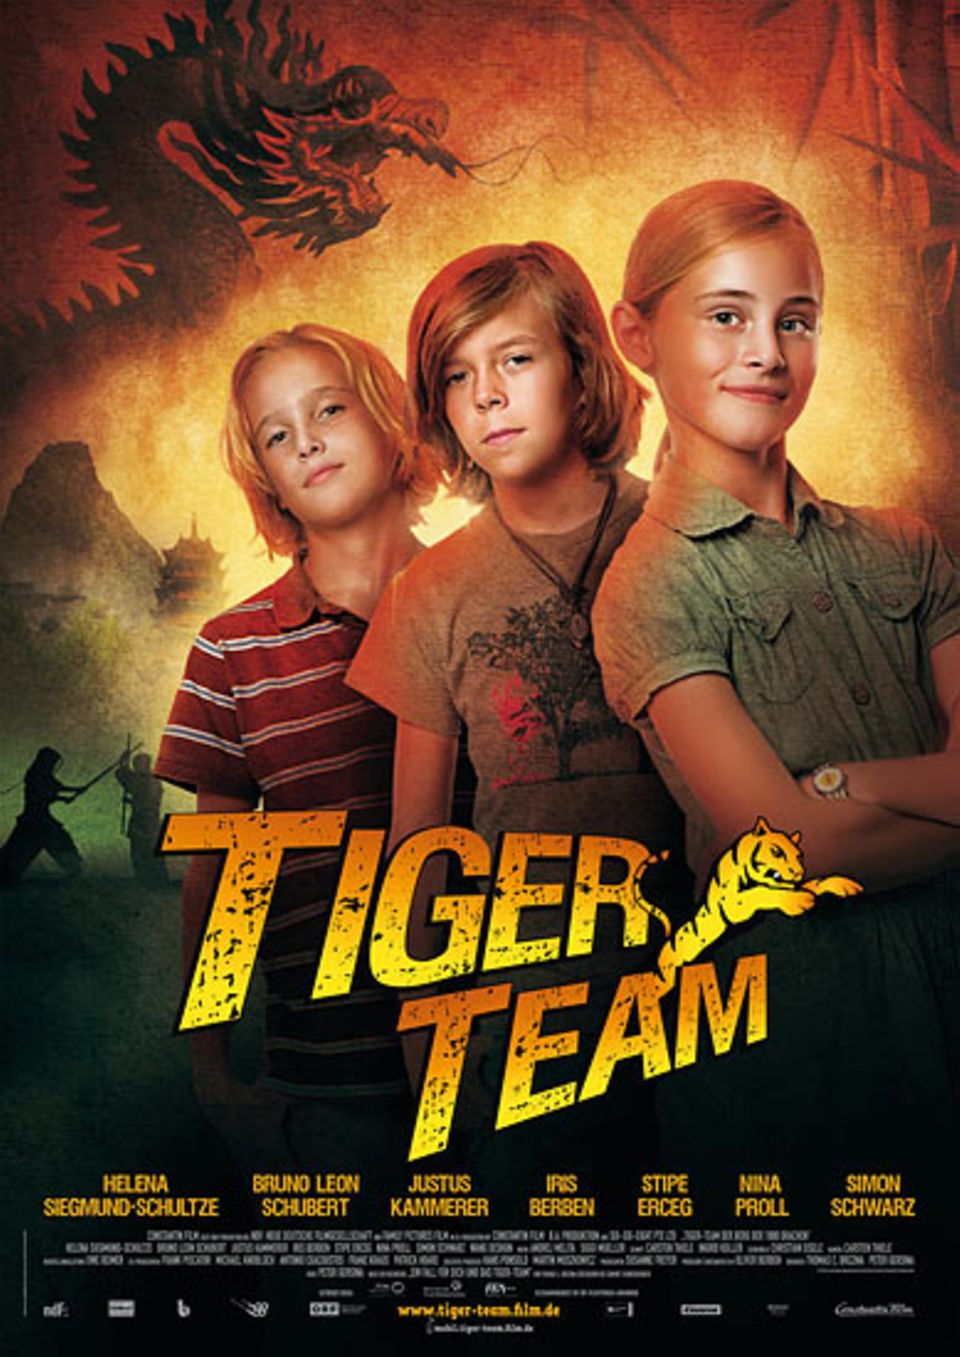 Das offizielle Plakat zum Film